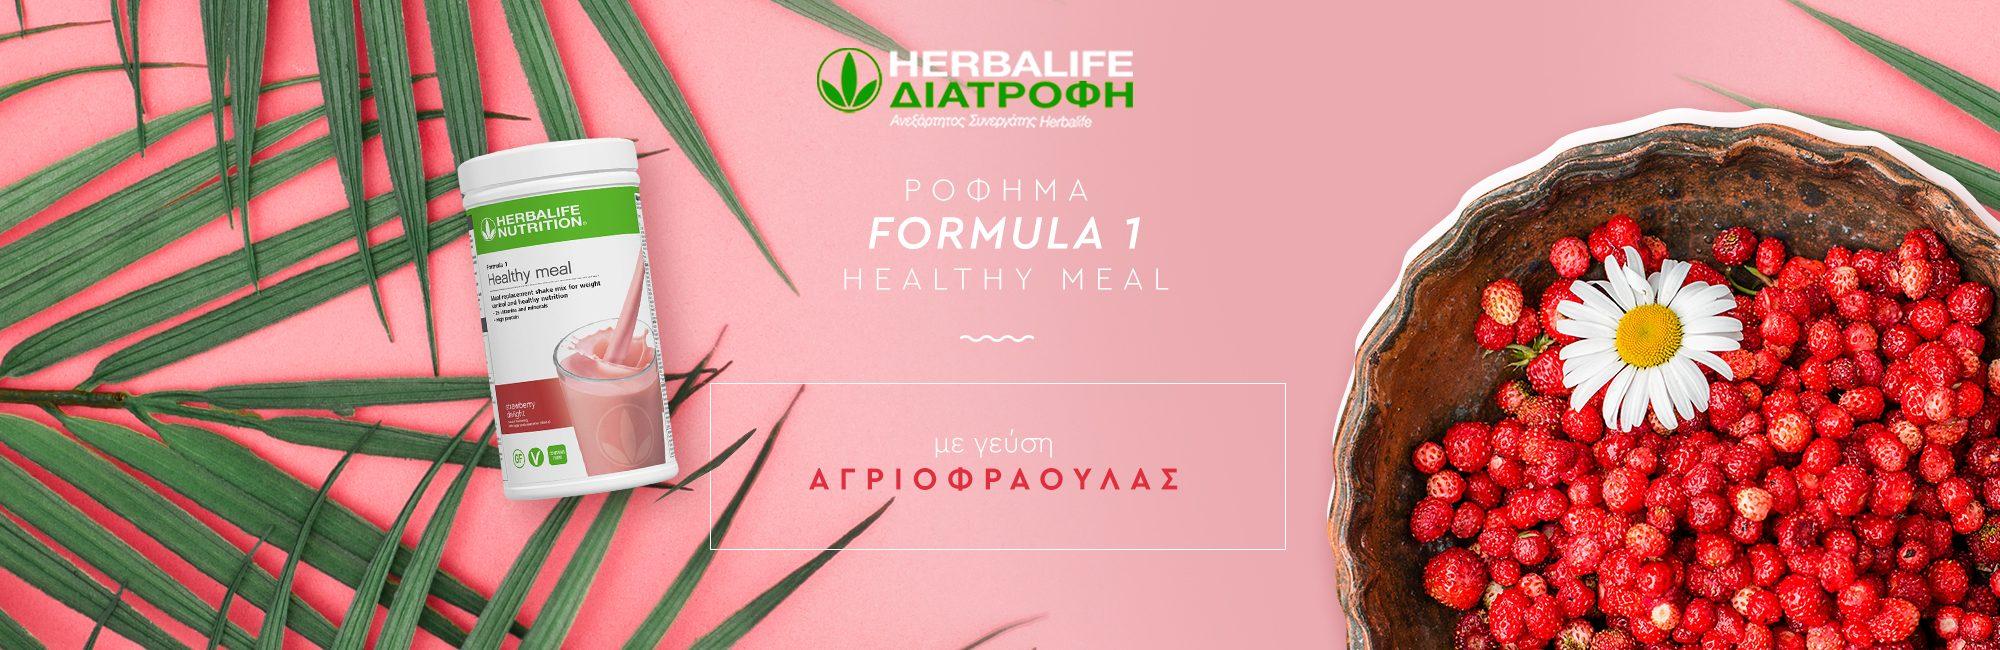 herbalife-banners-2000x650-strawberry